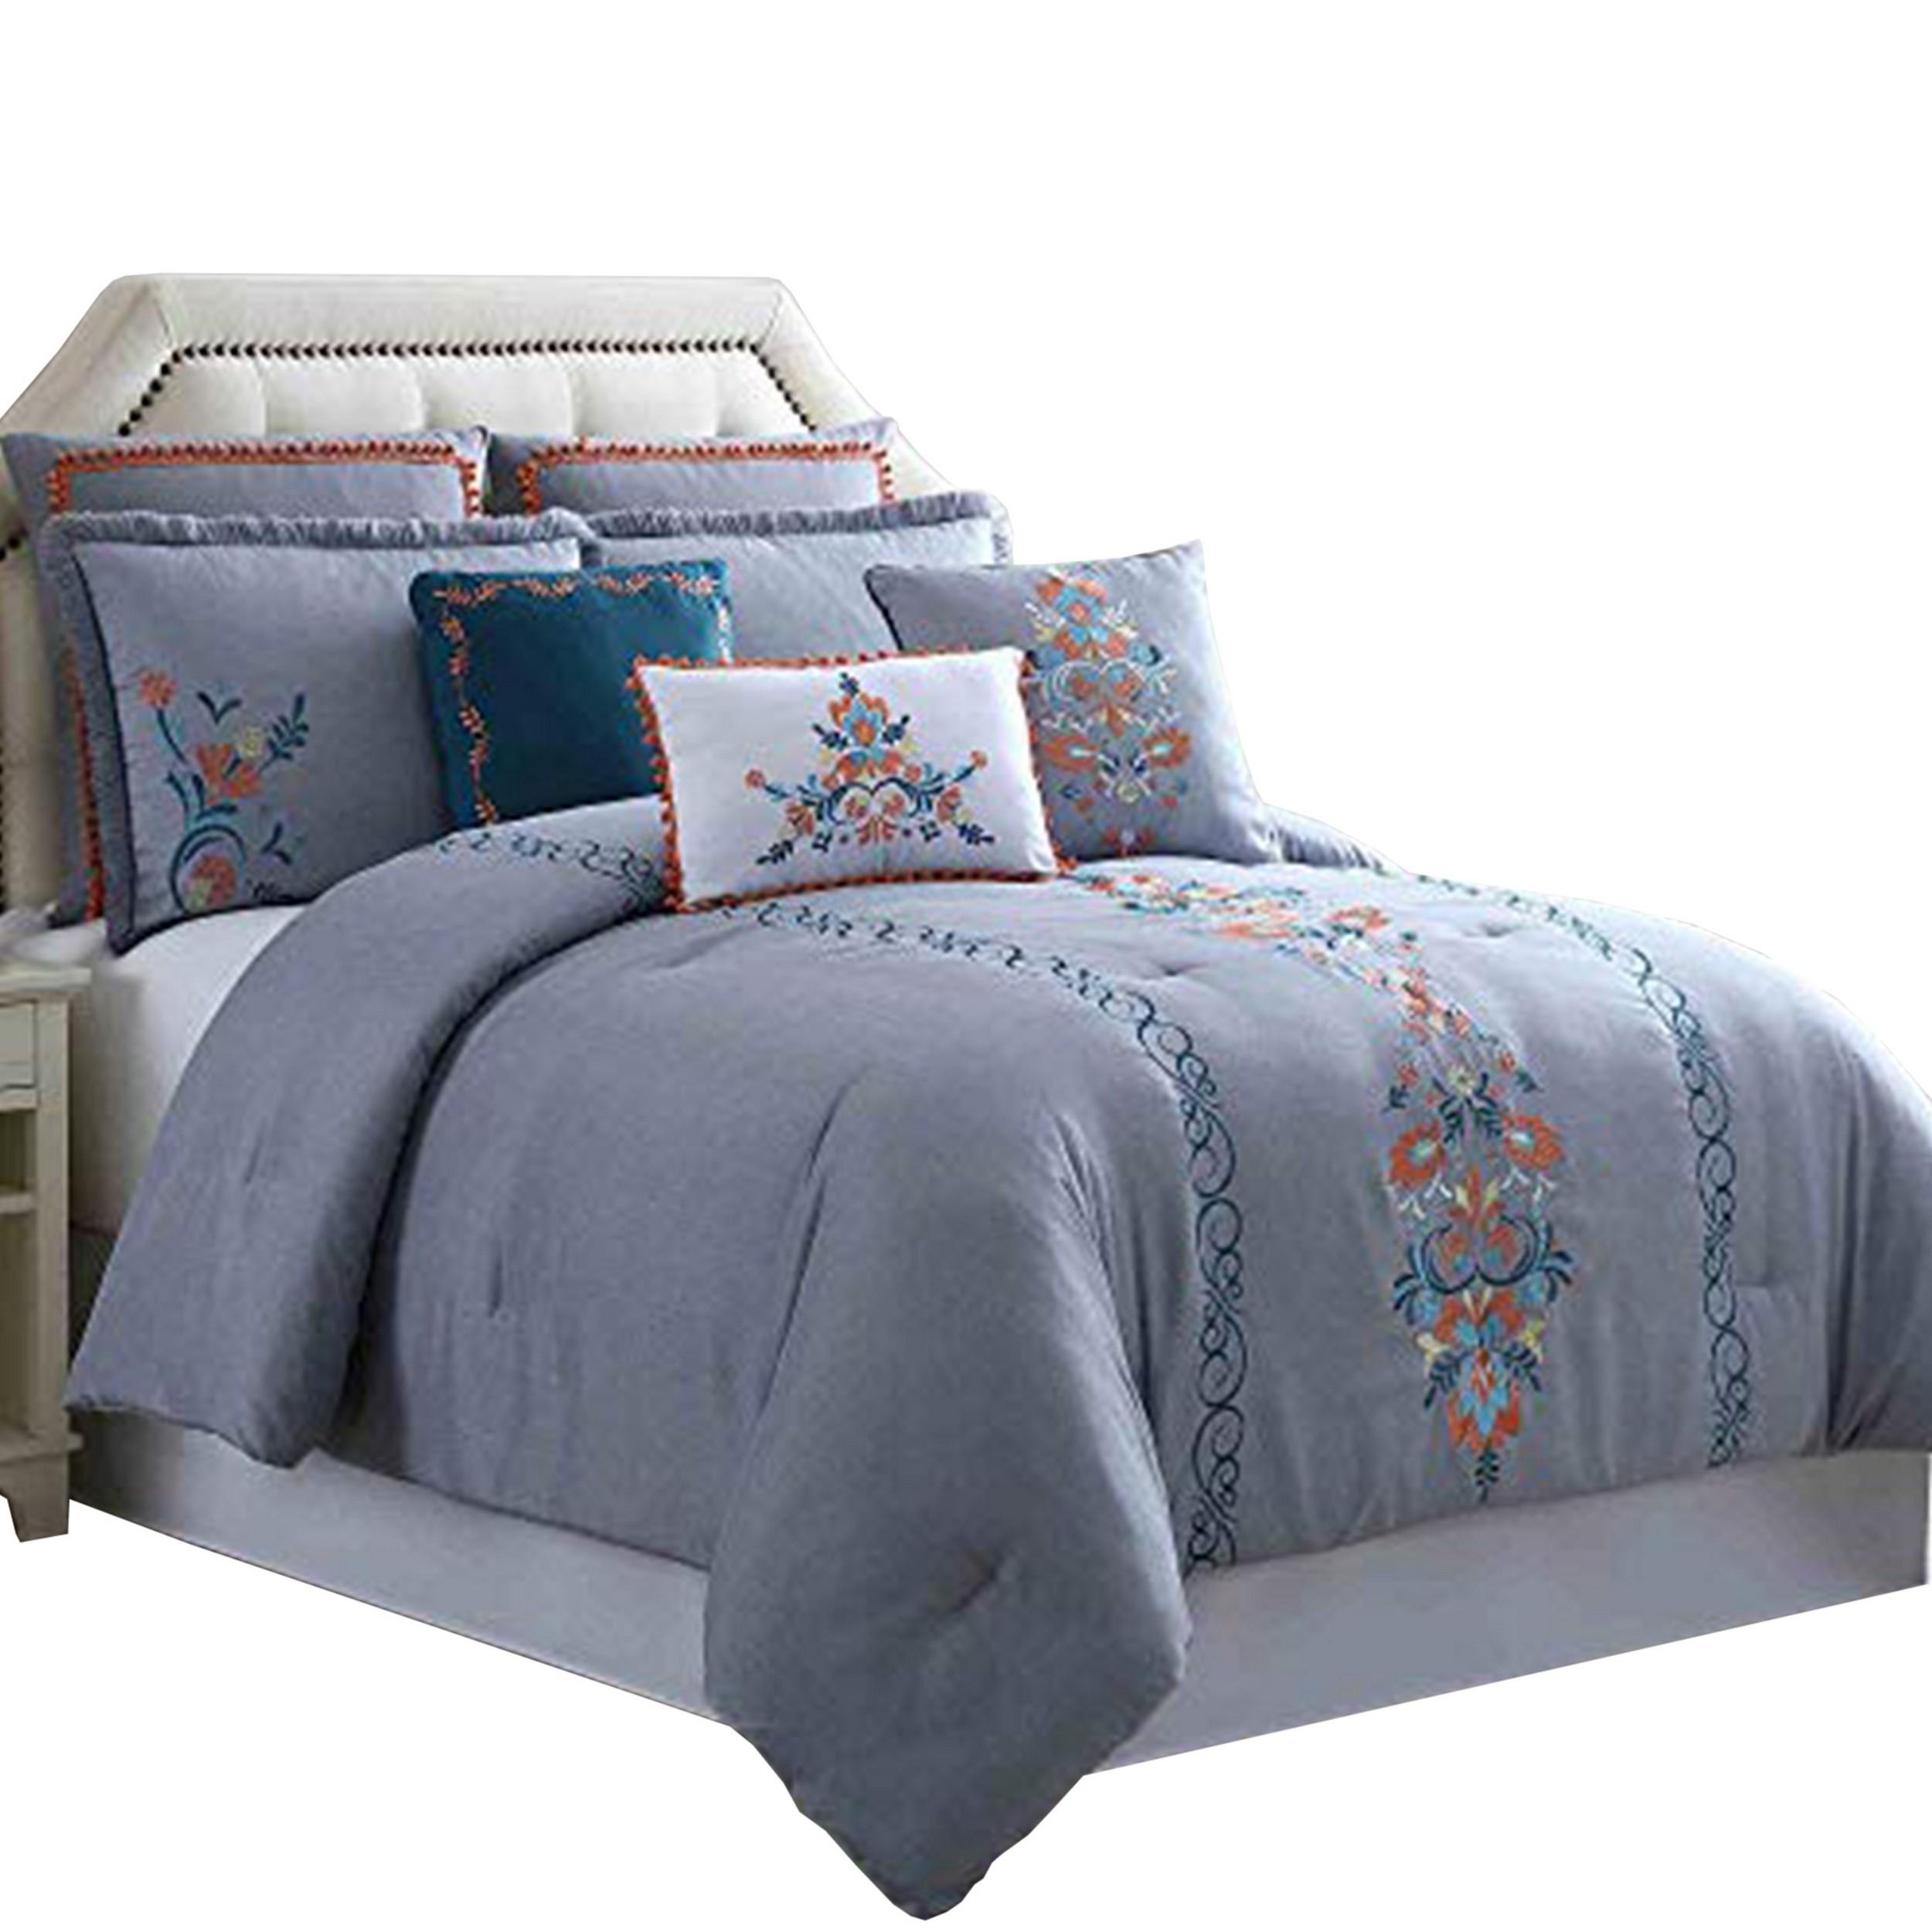 Sherpi Odense 8 Piece King Comforter